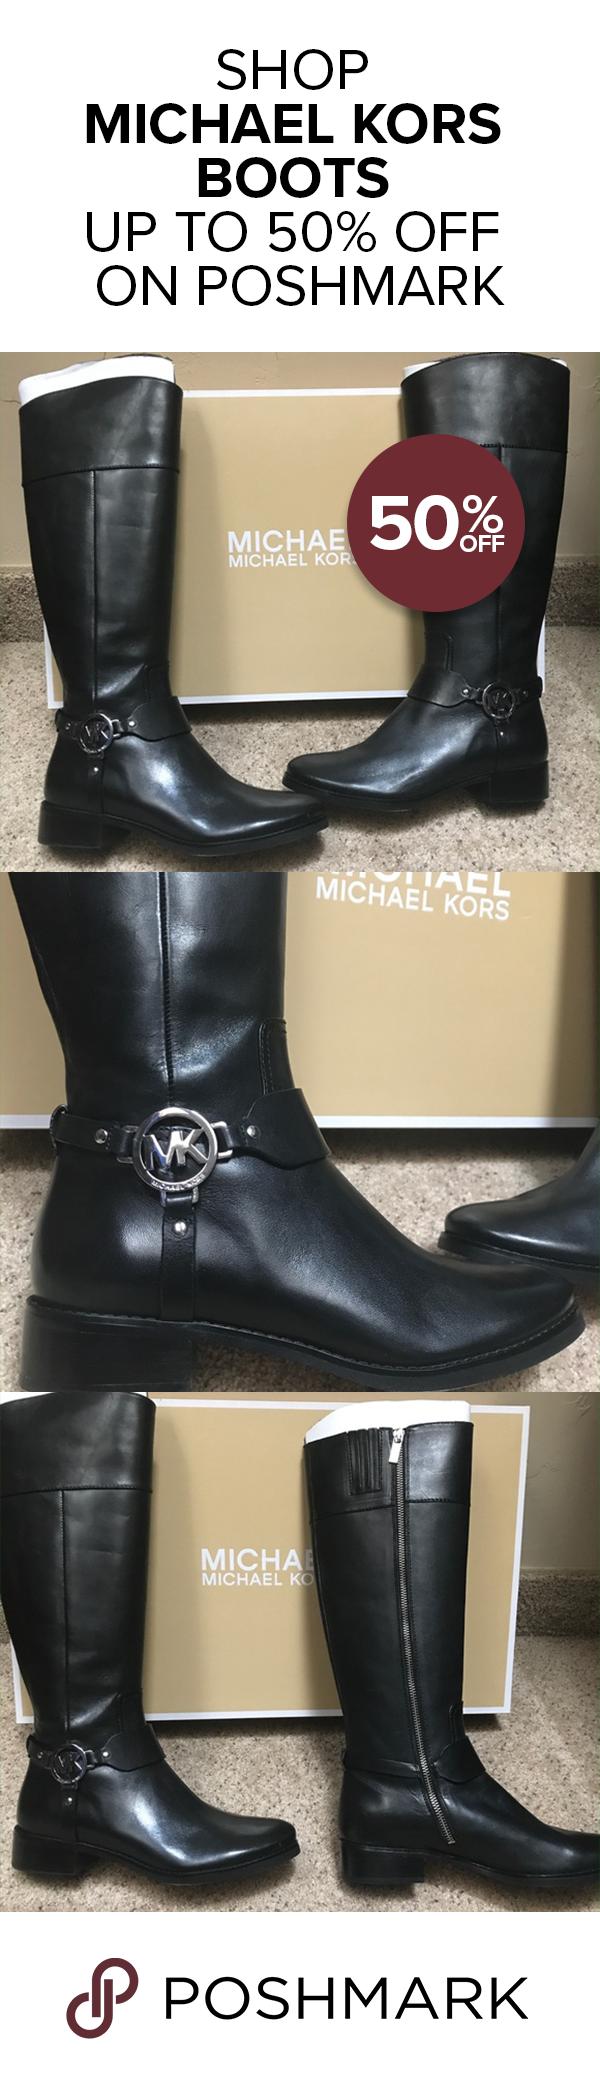 Shop designer rain boots at up to 70 off on Poshmark